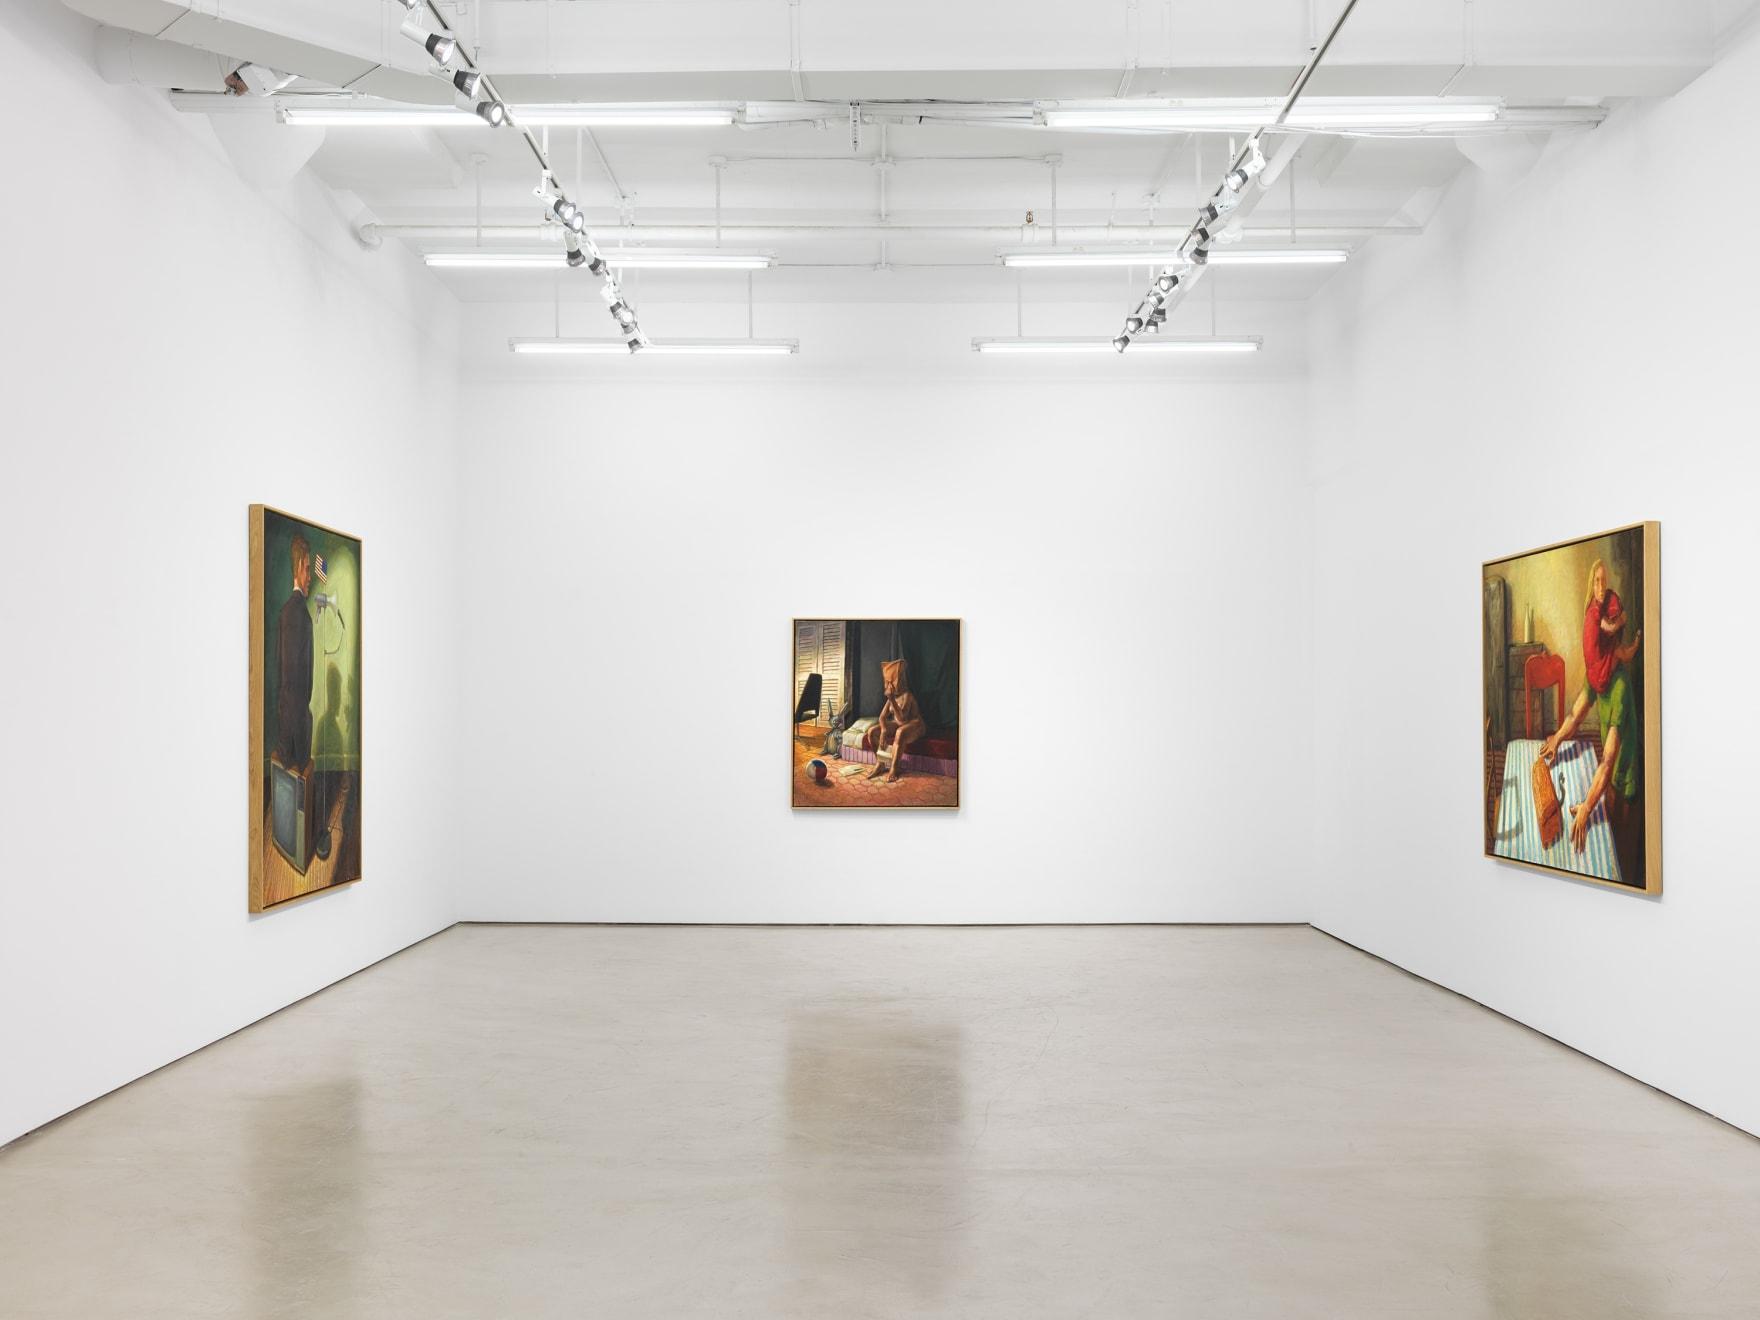 Hugh Steers: Strange State of Being, installation view, Alexander Gray Associates, New York (2021)